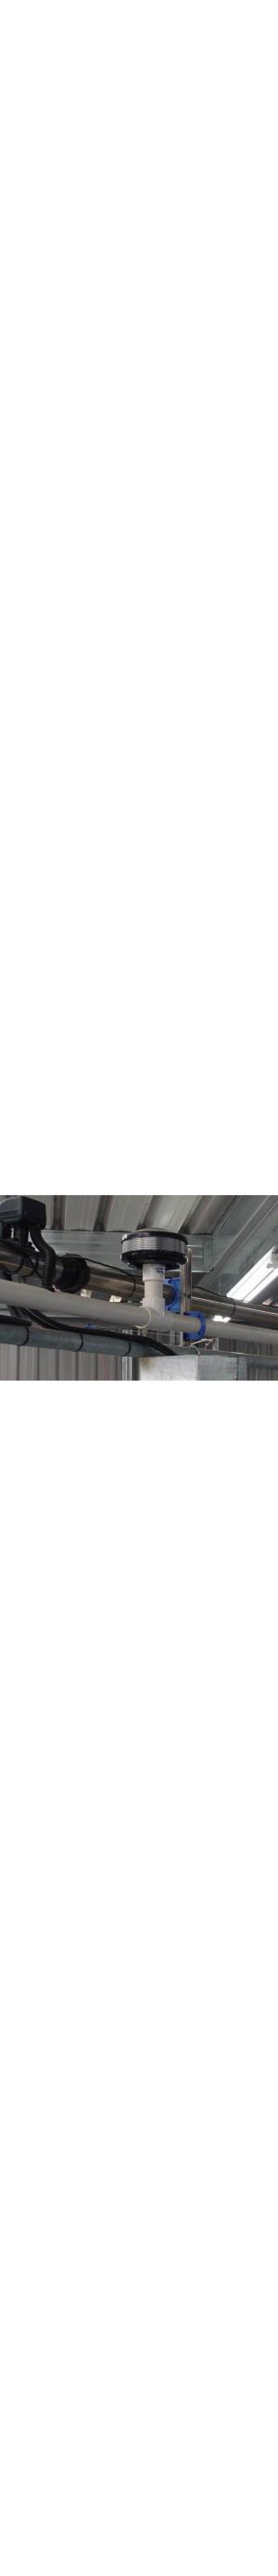 Pulsation Filtered Air